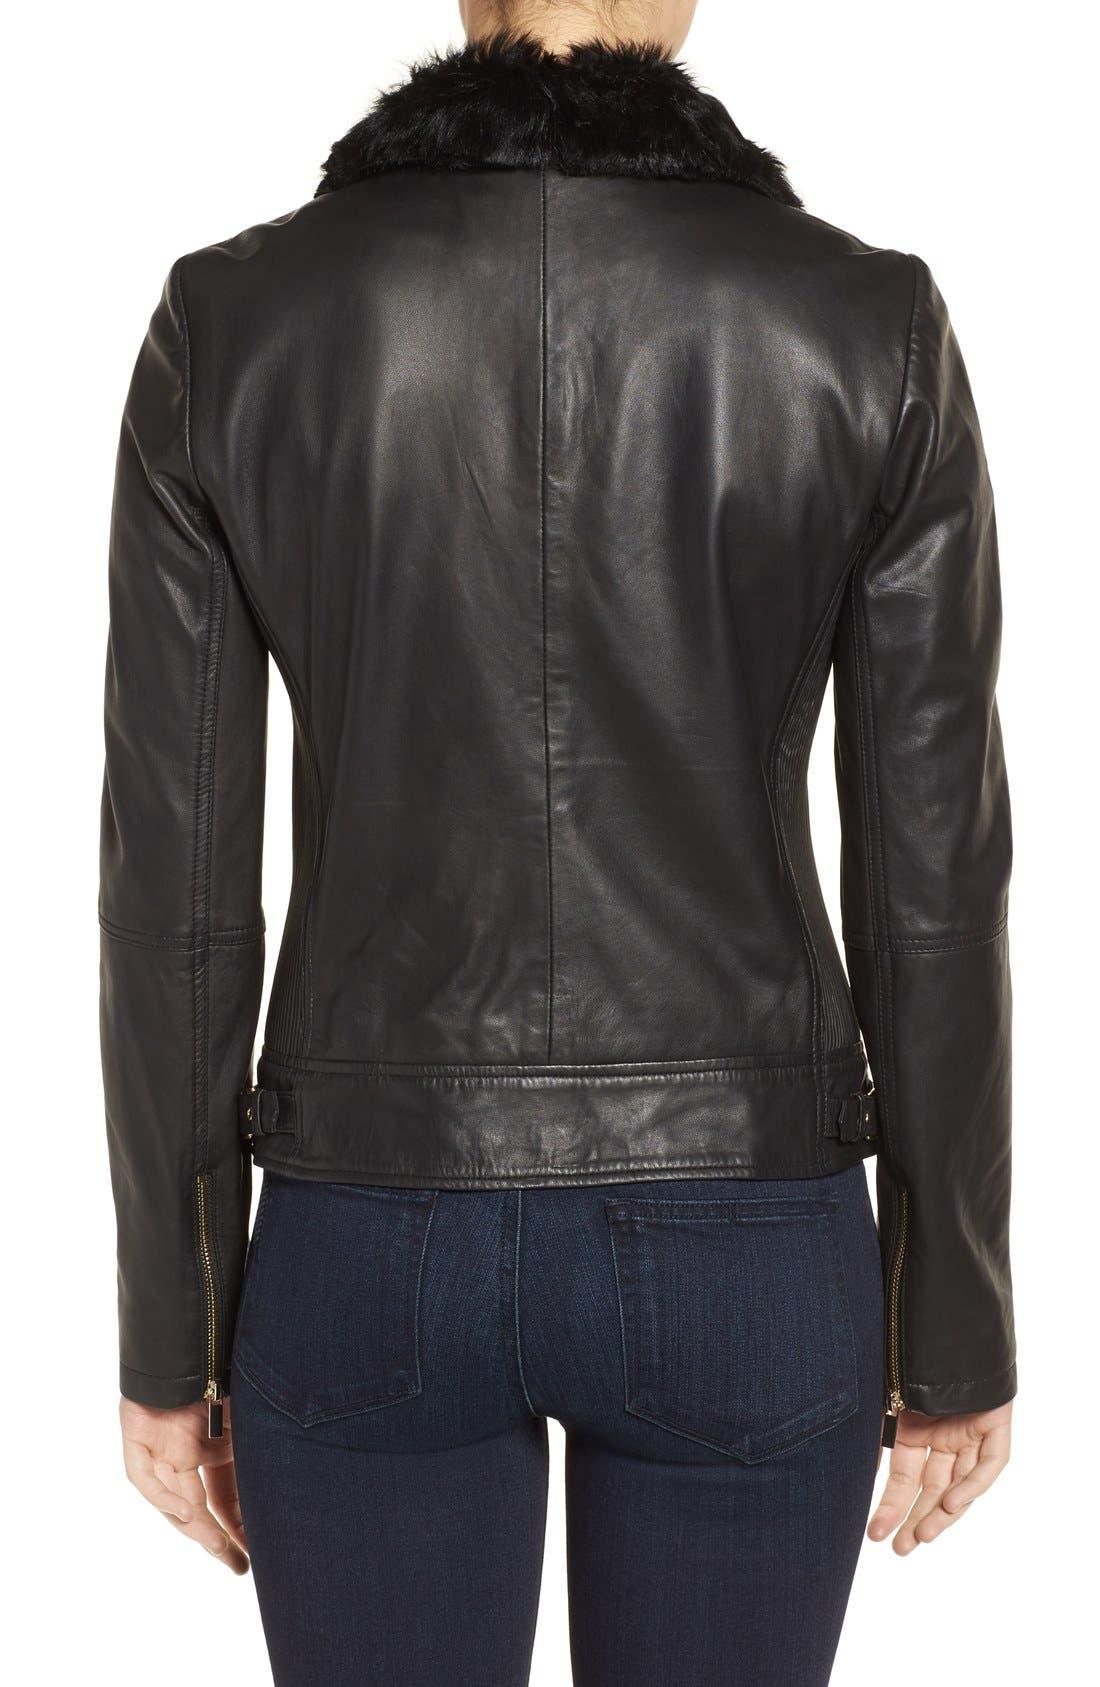 Alternate Image 2  - Badgley Mischka 'Irina' Leather Moto Jacket with Genuine Shearling Collar